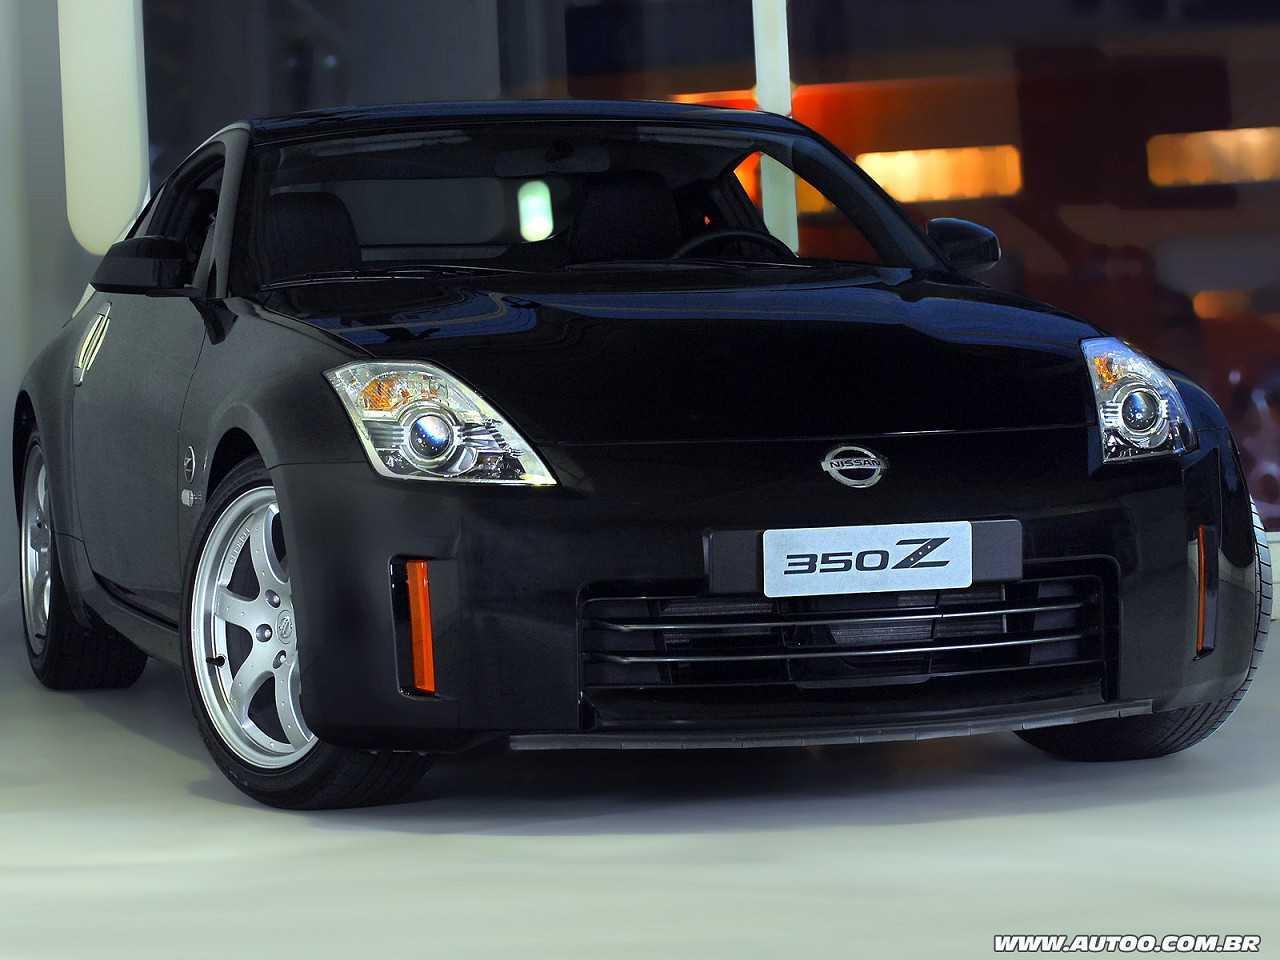 Nissan 350z Autoo